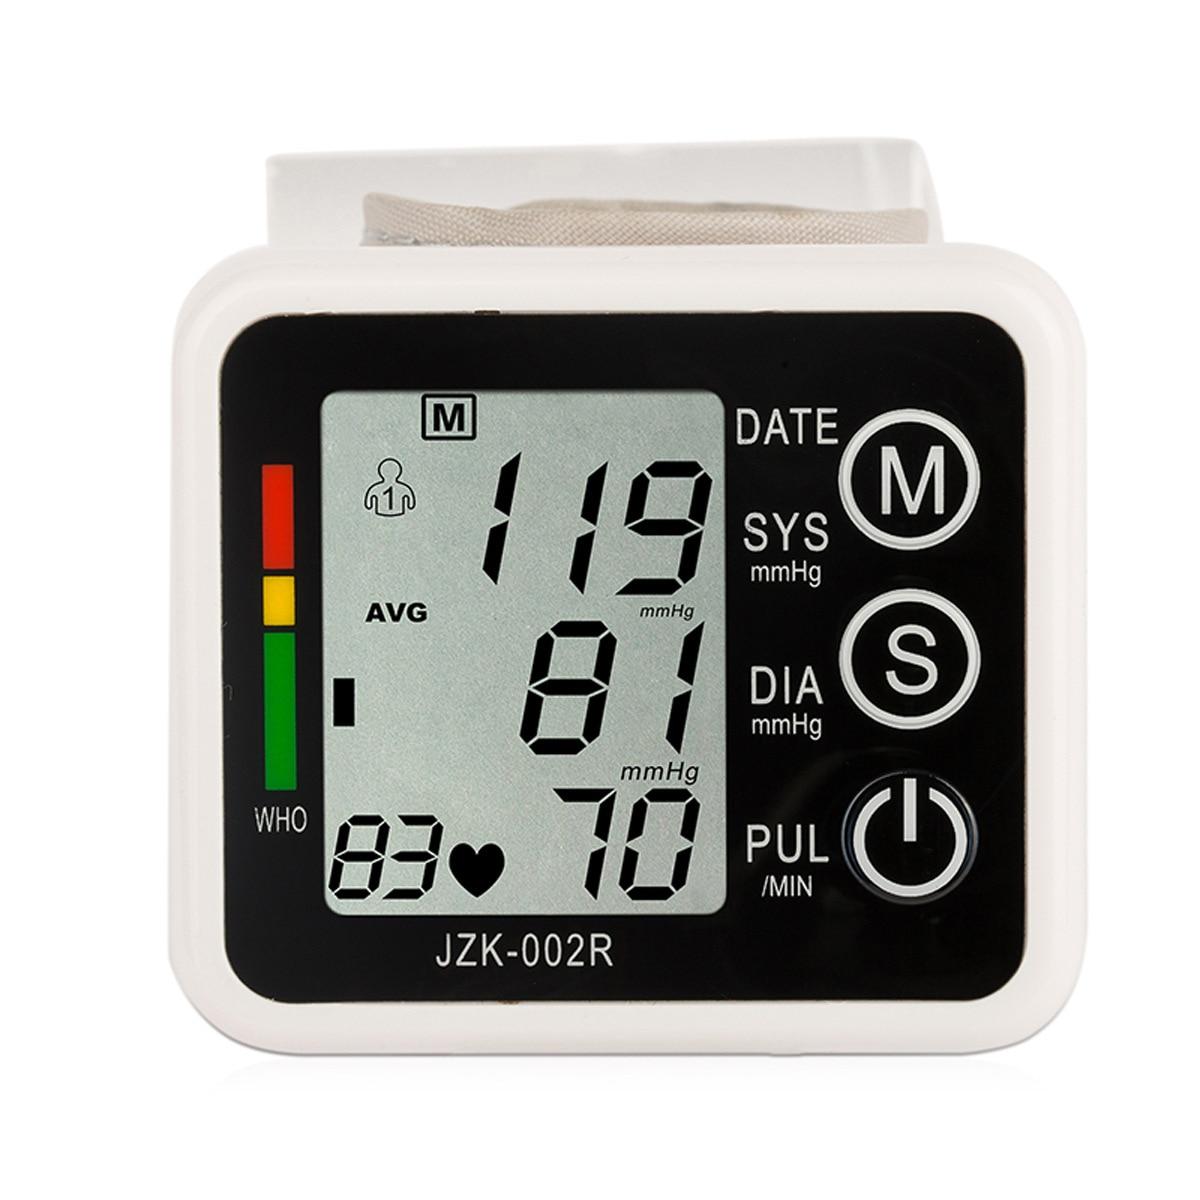 Pulse Meter Digital Lcd Wrist Blood Pressure Arm Monitors Sphygmomanometer Household Health Care Device Medical Electronic